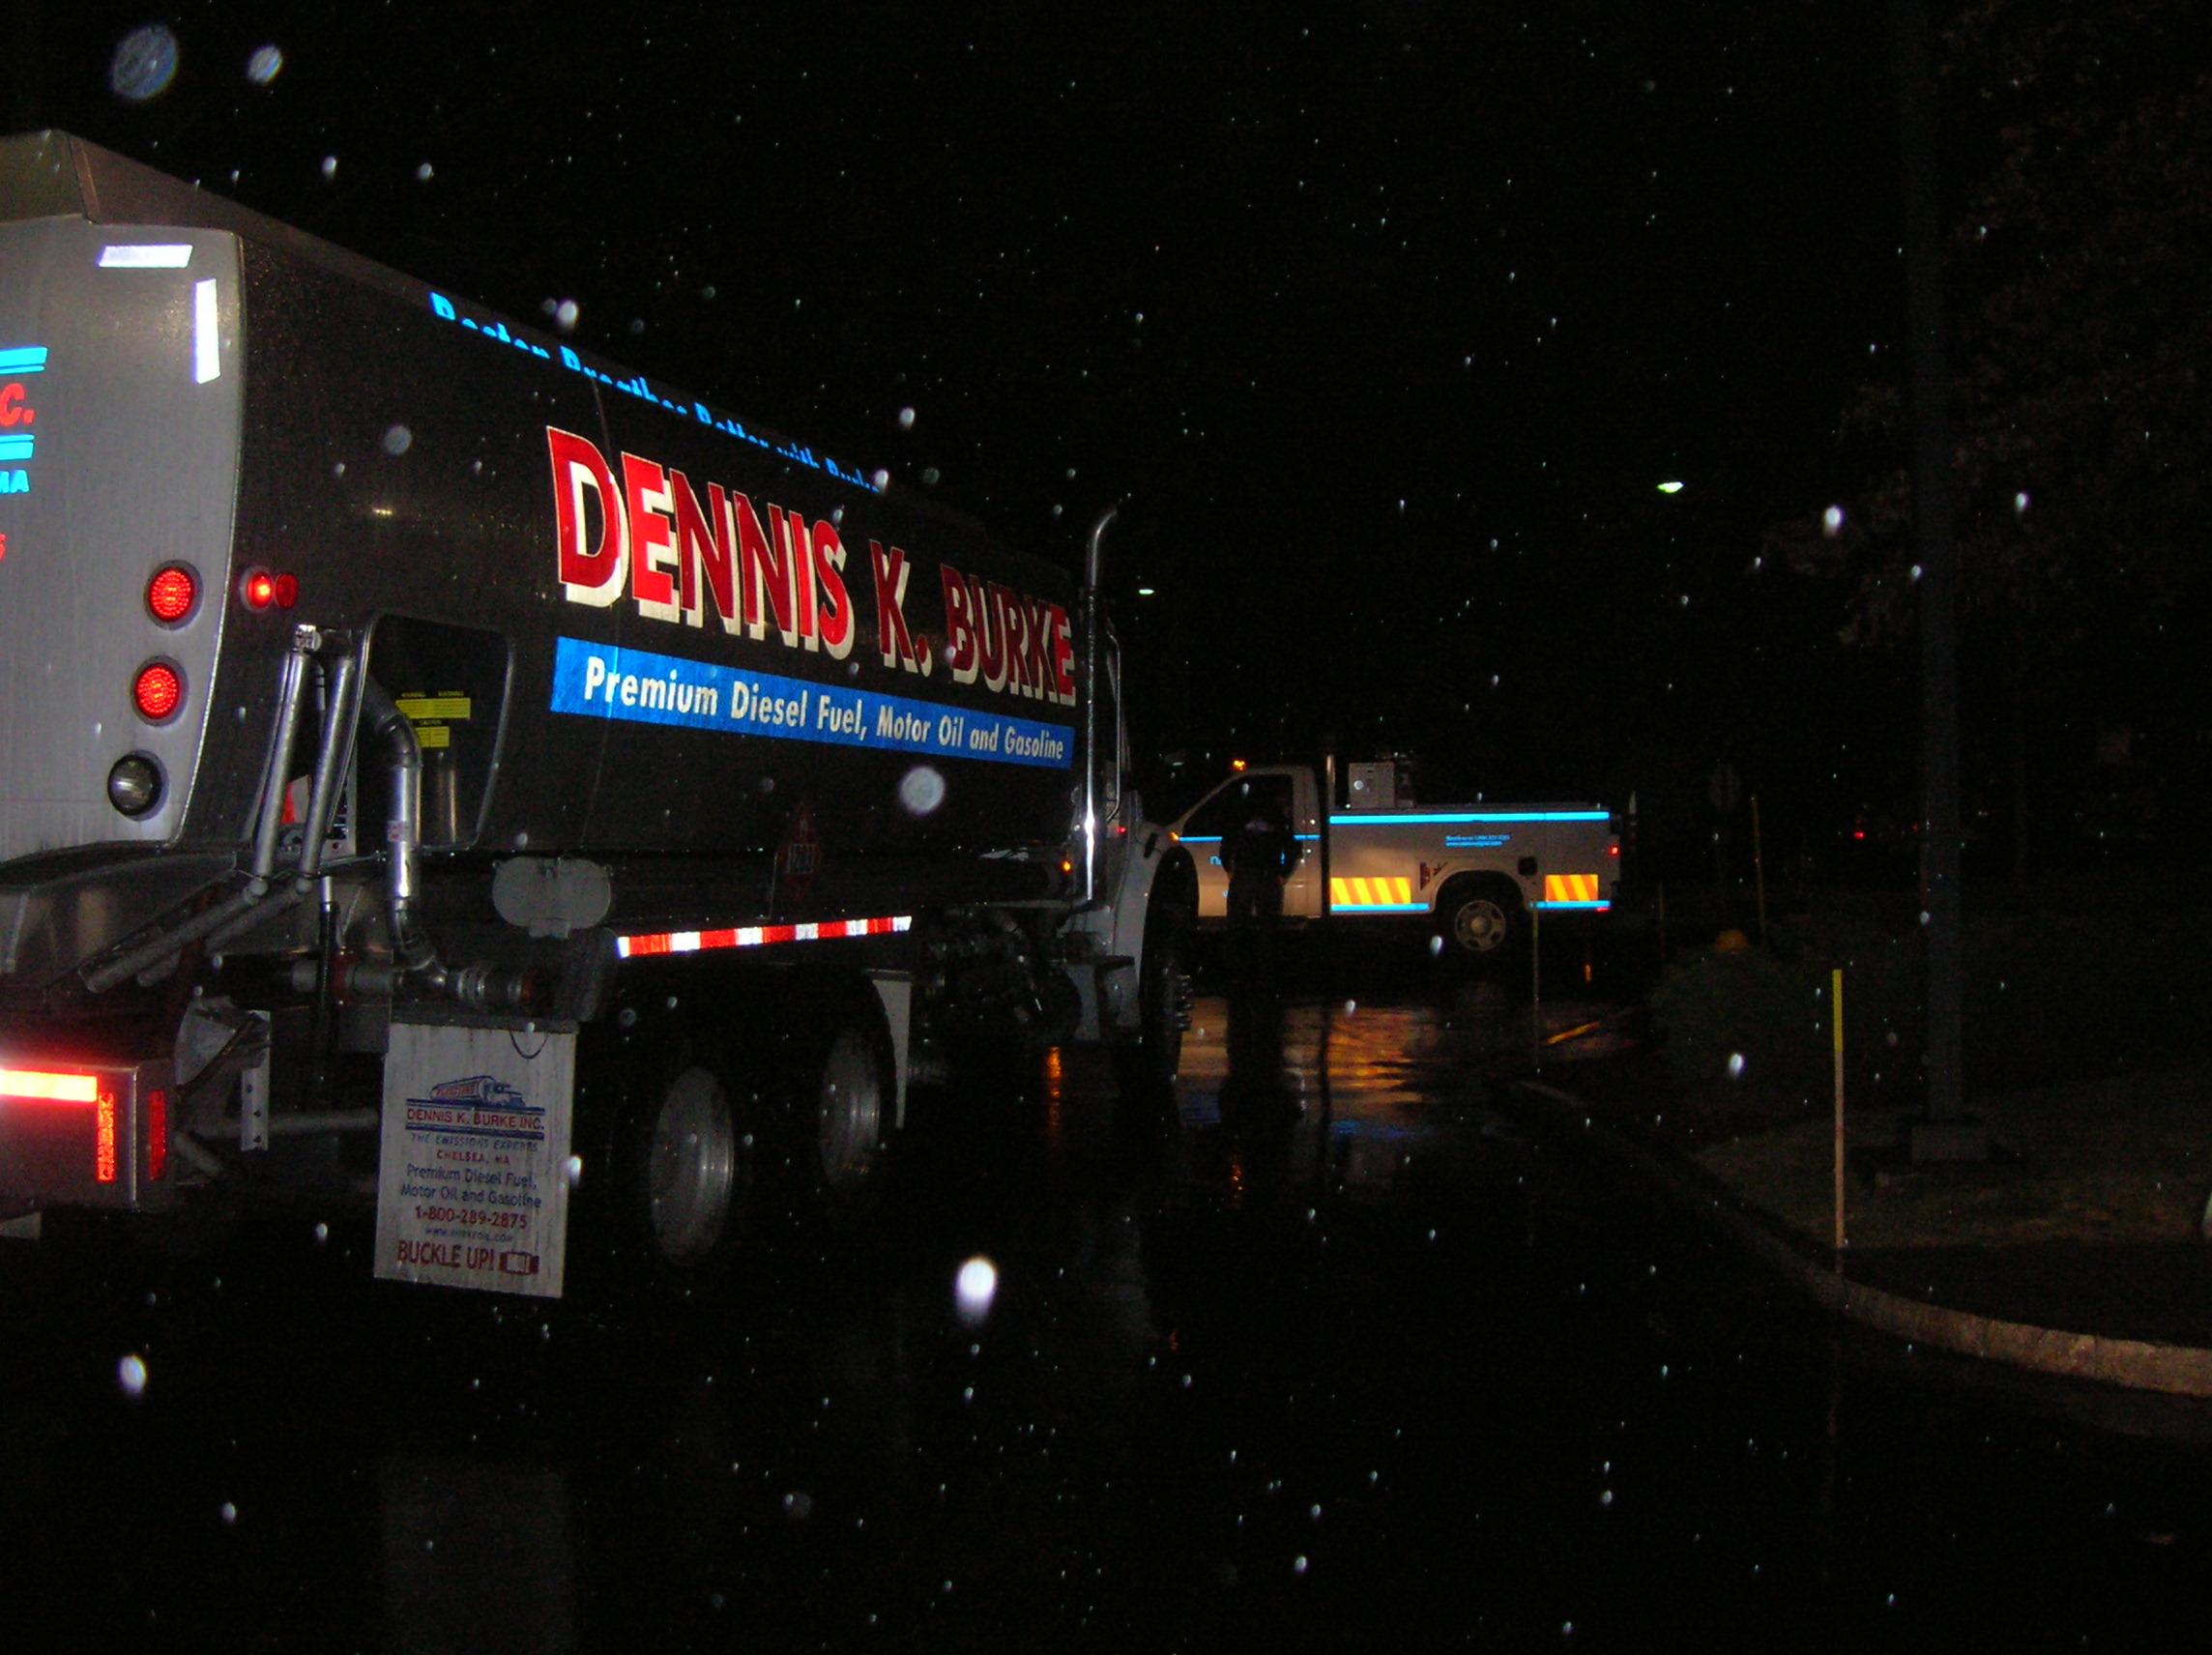 Dennis K. Burke refueling truck performing an emergency refueling at night